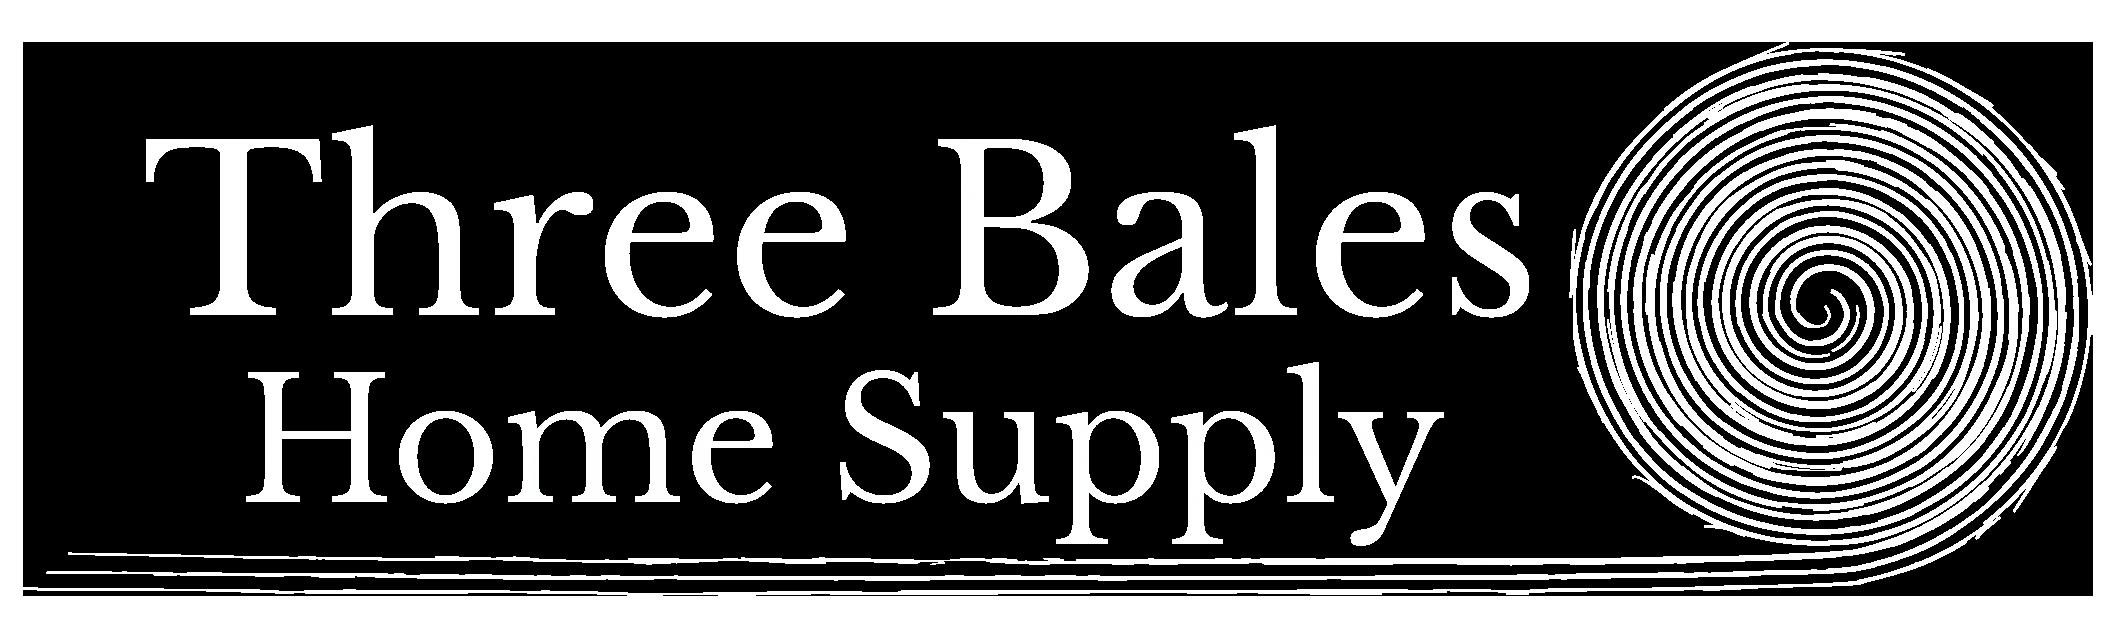 Three Bales Home Supply LLC